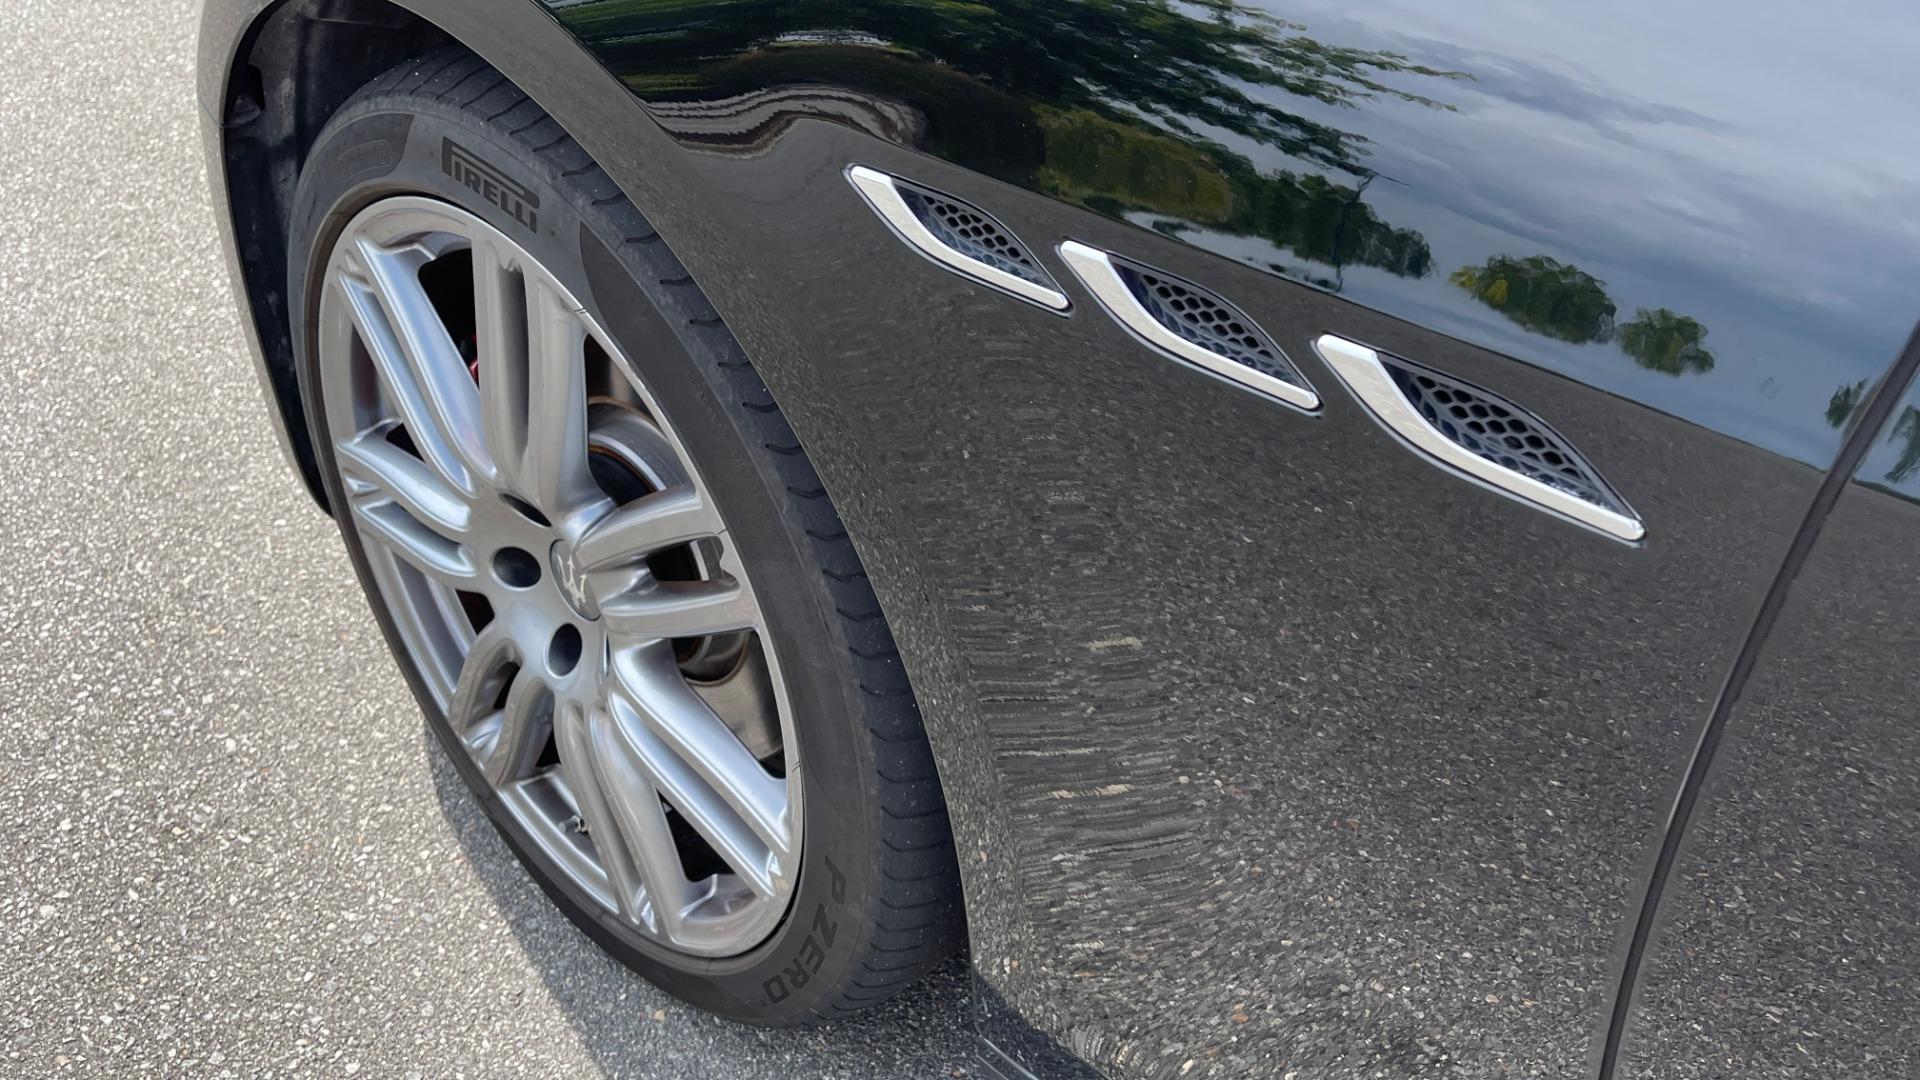 Used 2018 Maserati GHIBLI 3.0L SEDAN / 8-SPD AUTO / NAV / SUNROOF / REARVIEW for sale $42,995 at Formula Imports in Charlotte NC 28227 9